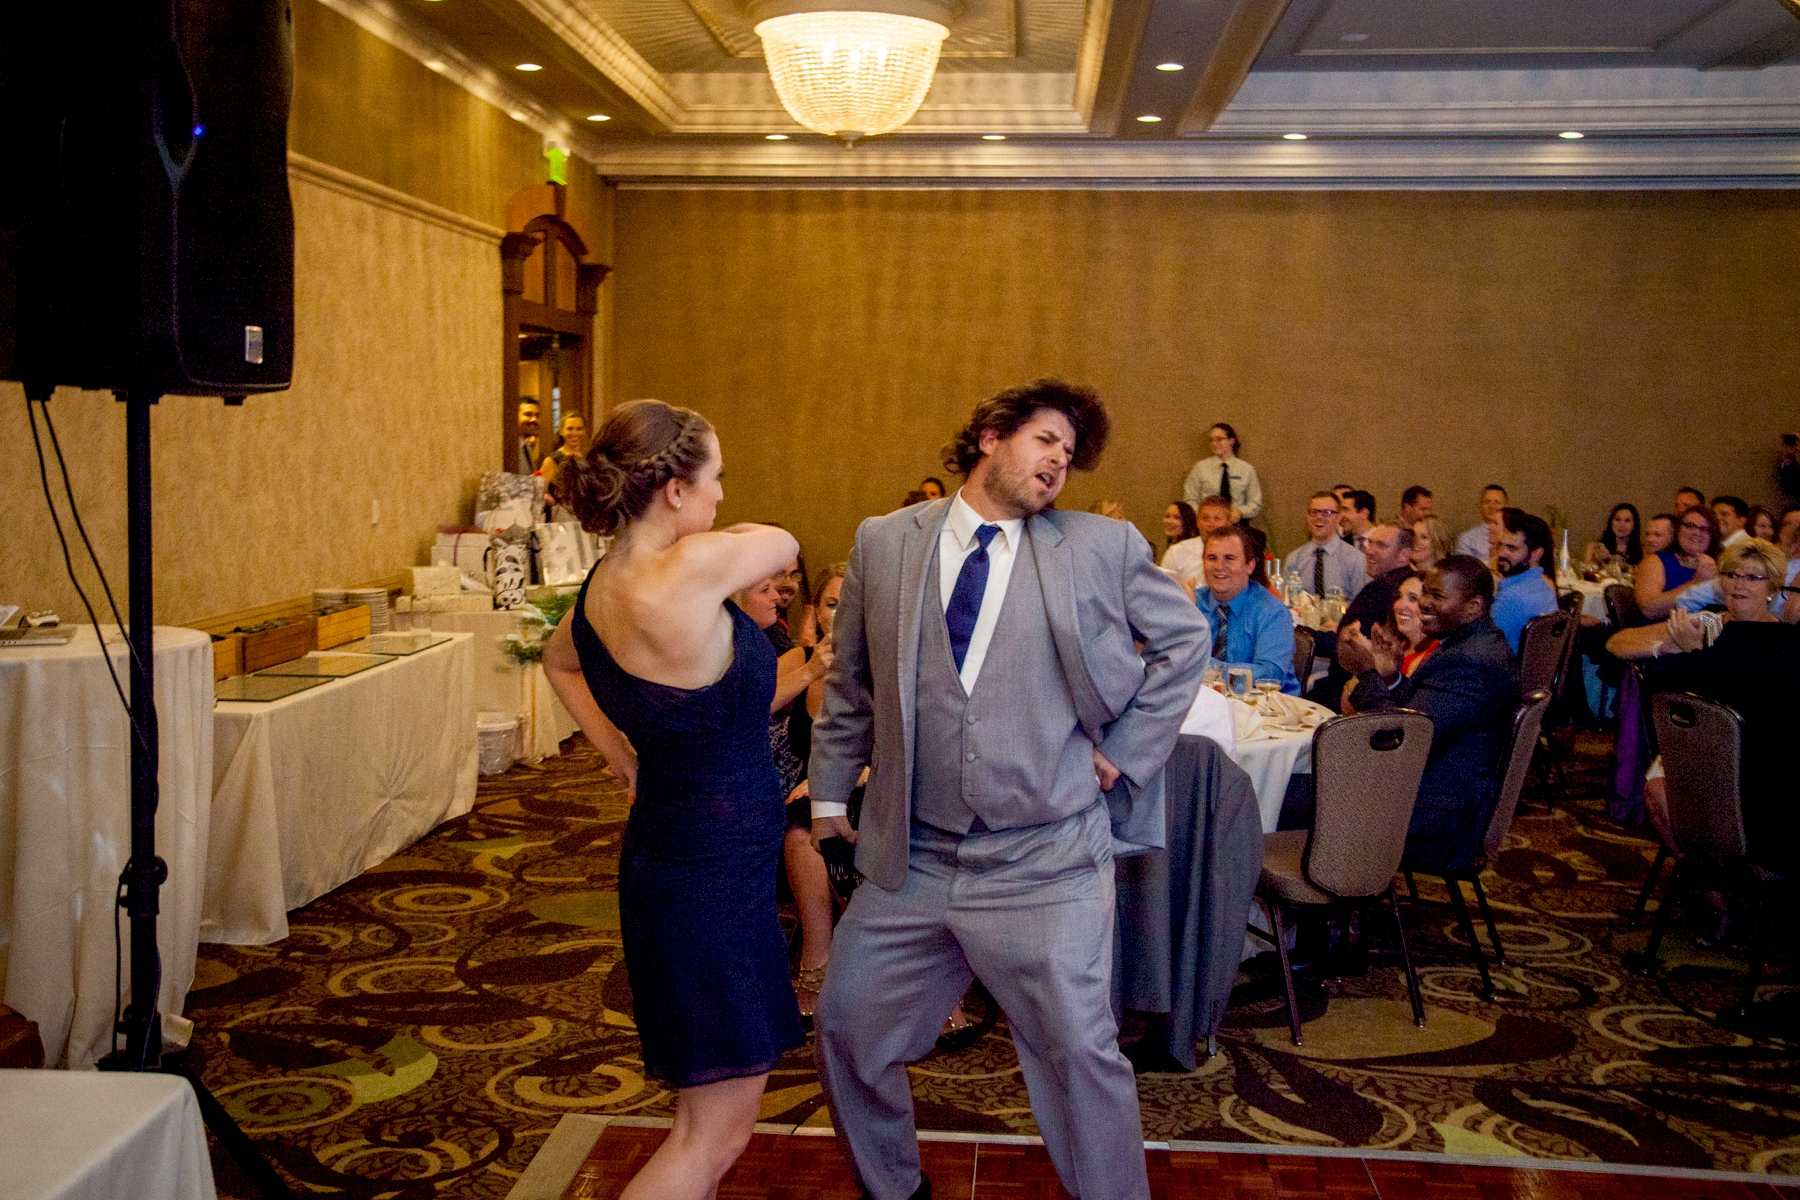 Brandon_Shafer_Photography_Chris_Lauren_Michigan_State_Capital_Wedding_0039.jpg